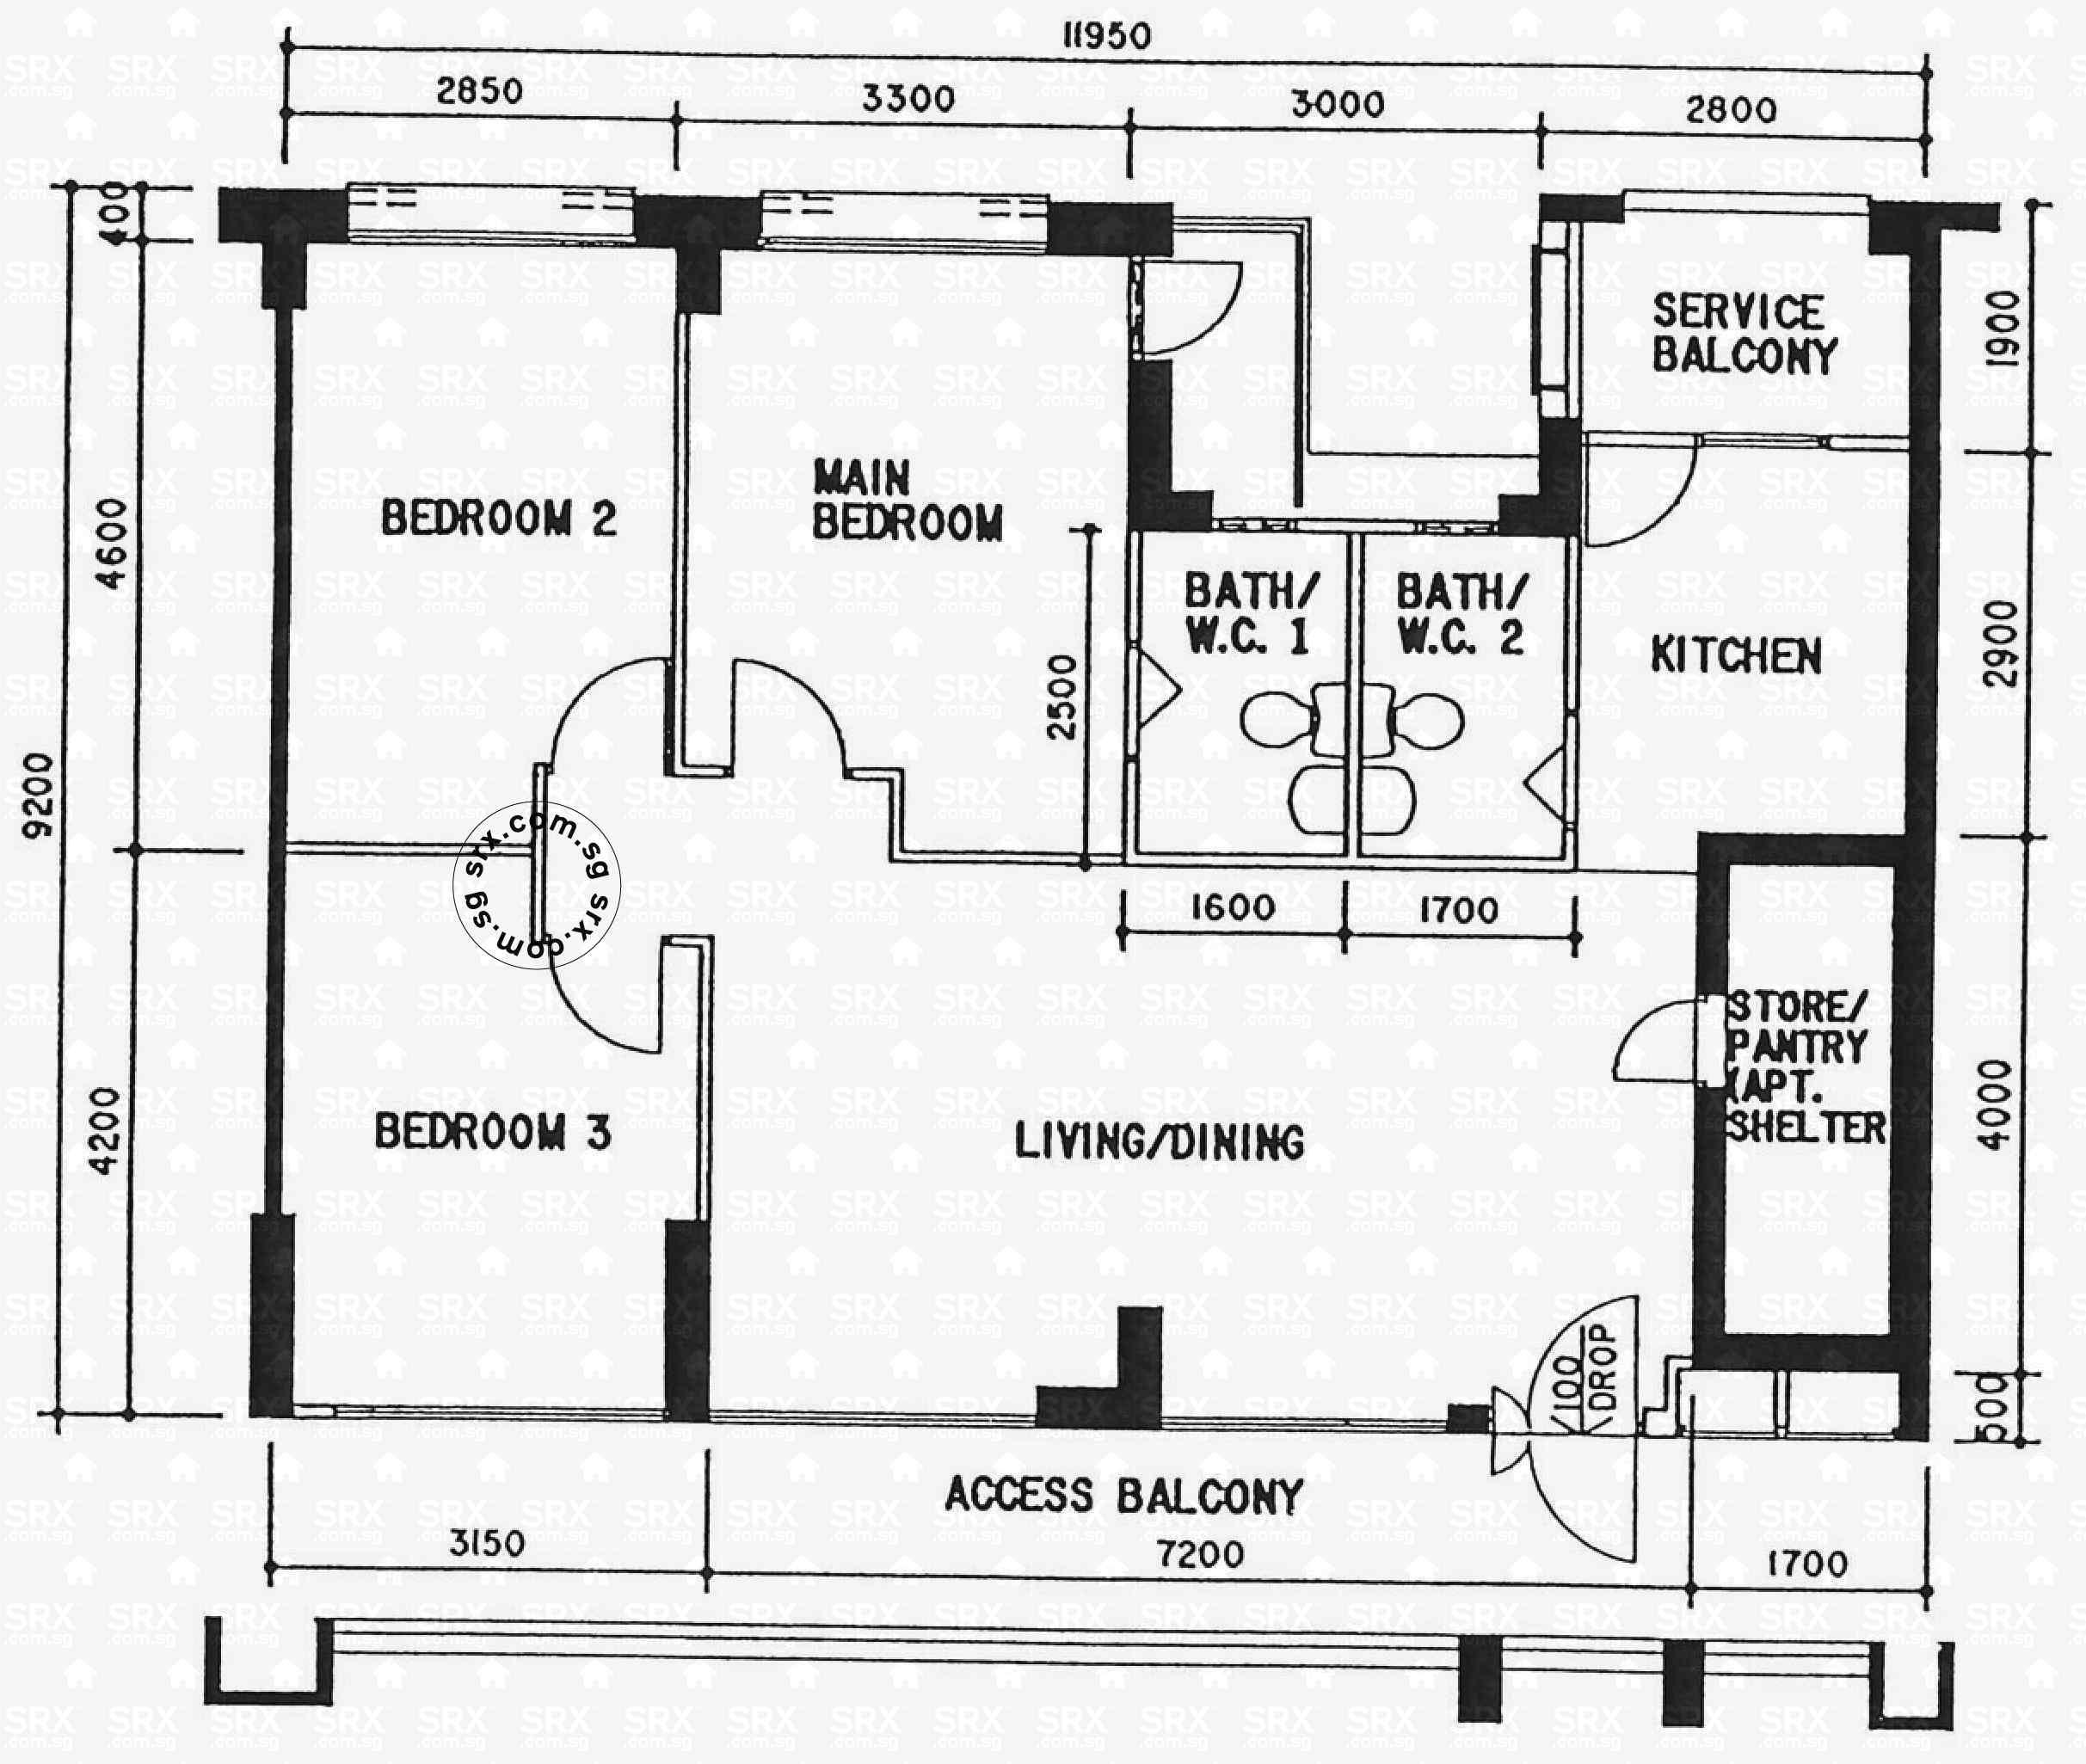 hougang street 91 hdb details srx property hougang street 52 hdb details srx property